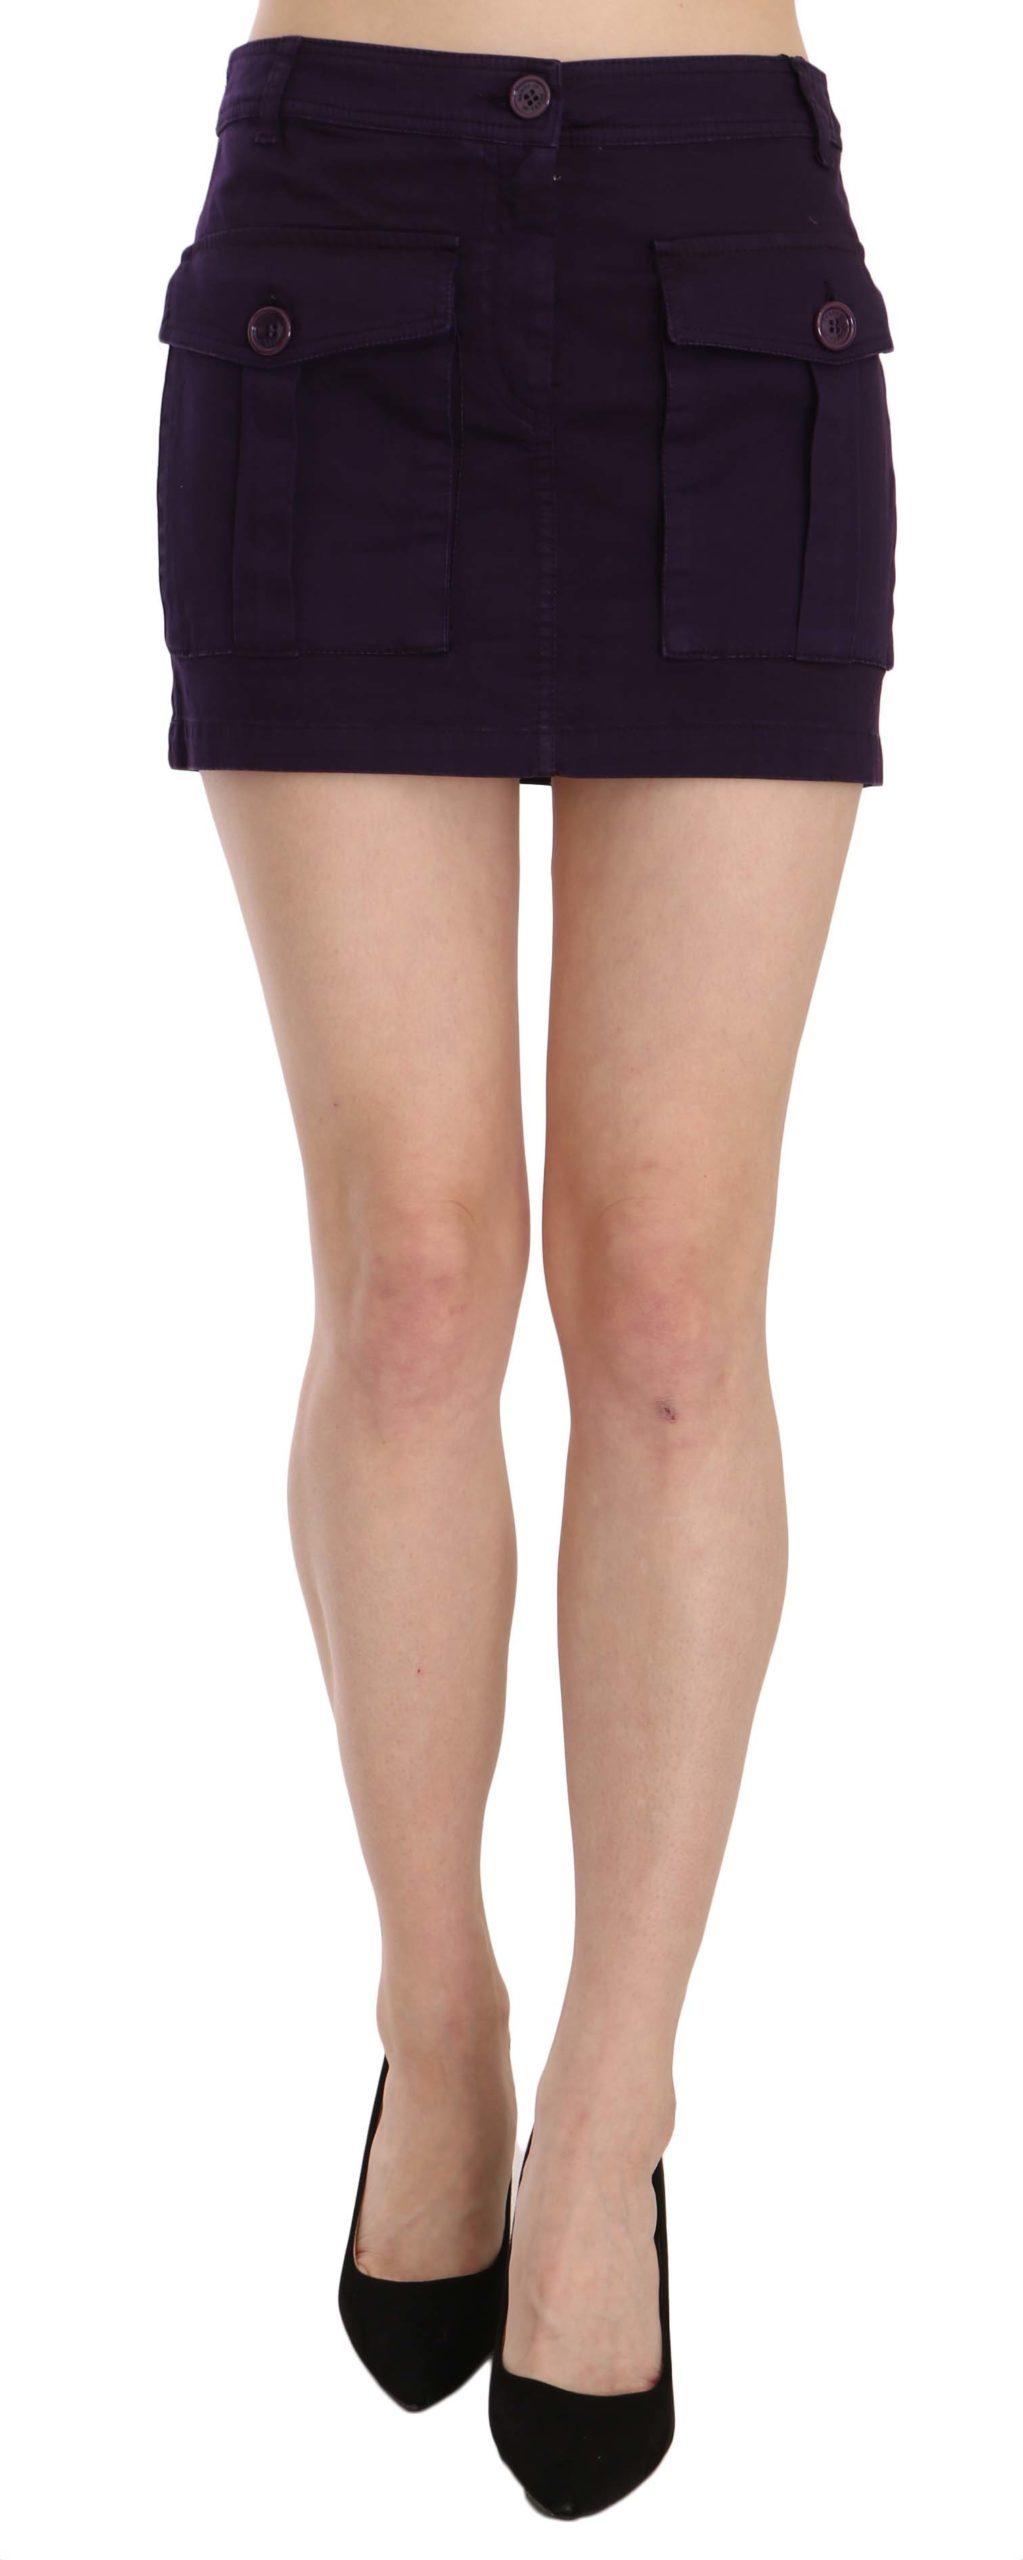 GF Ferre Women's High Waist Button Pocket A-line Mini Skirt Purple TSH3947 - IT40|S